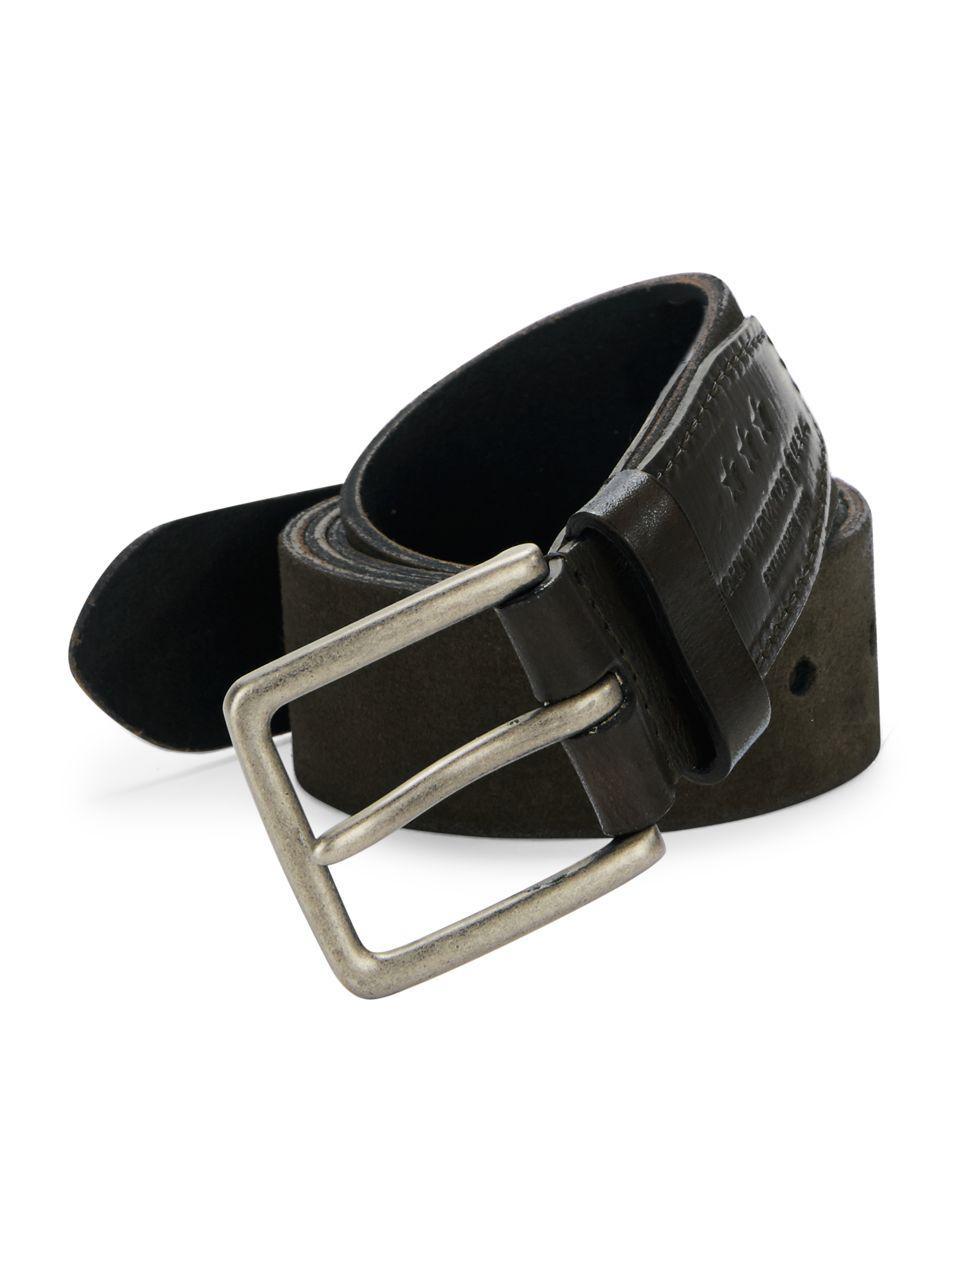 varvatos suede belt in brown for lyst